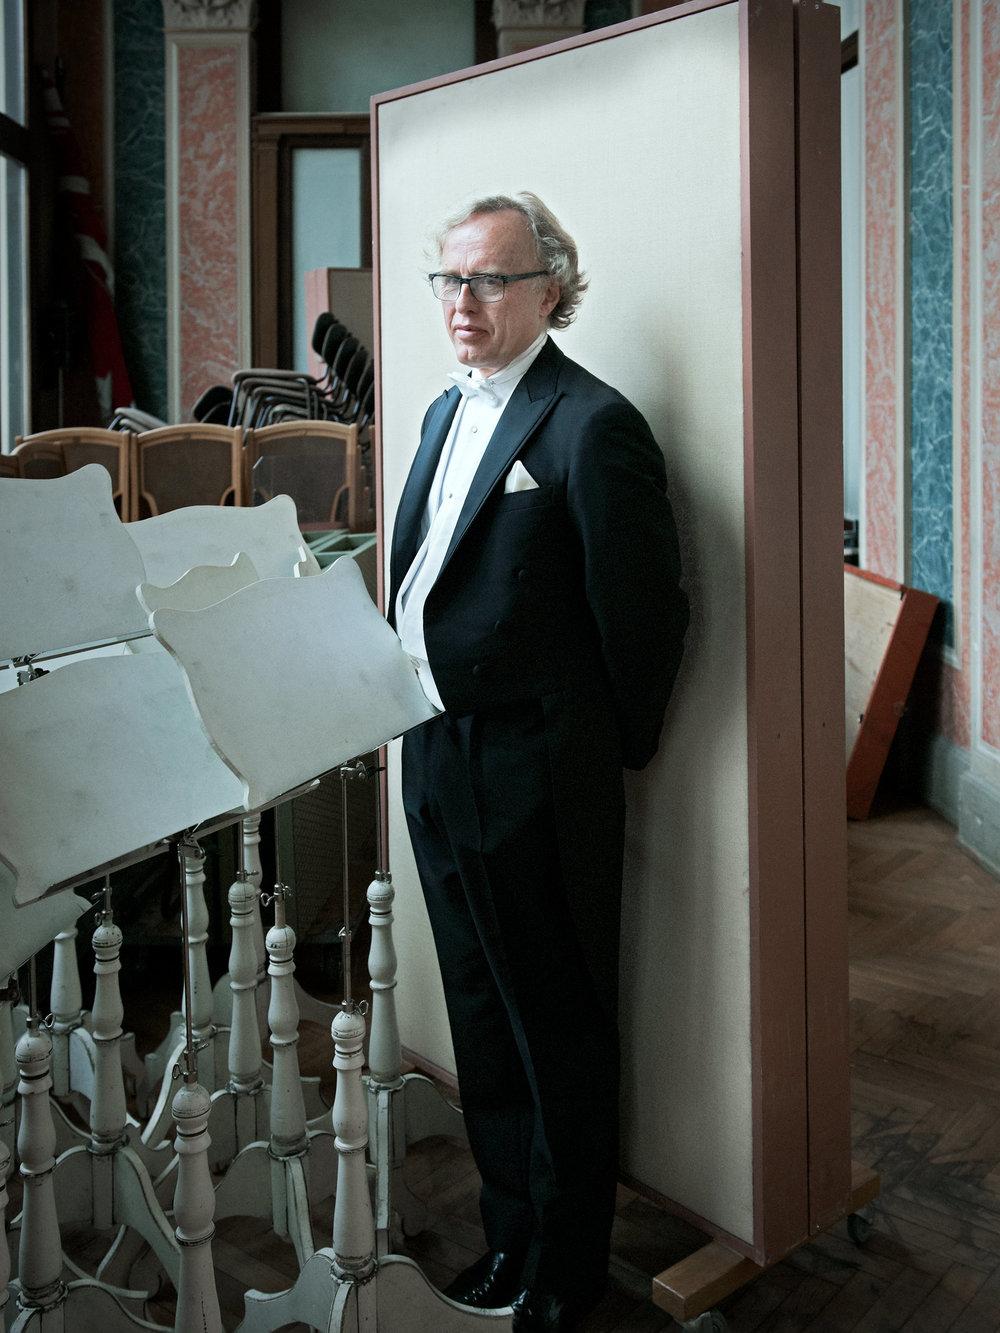 Martin Haselboeck